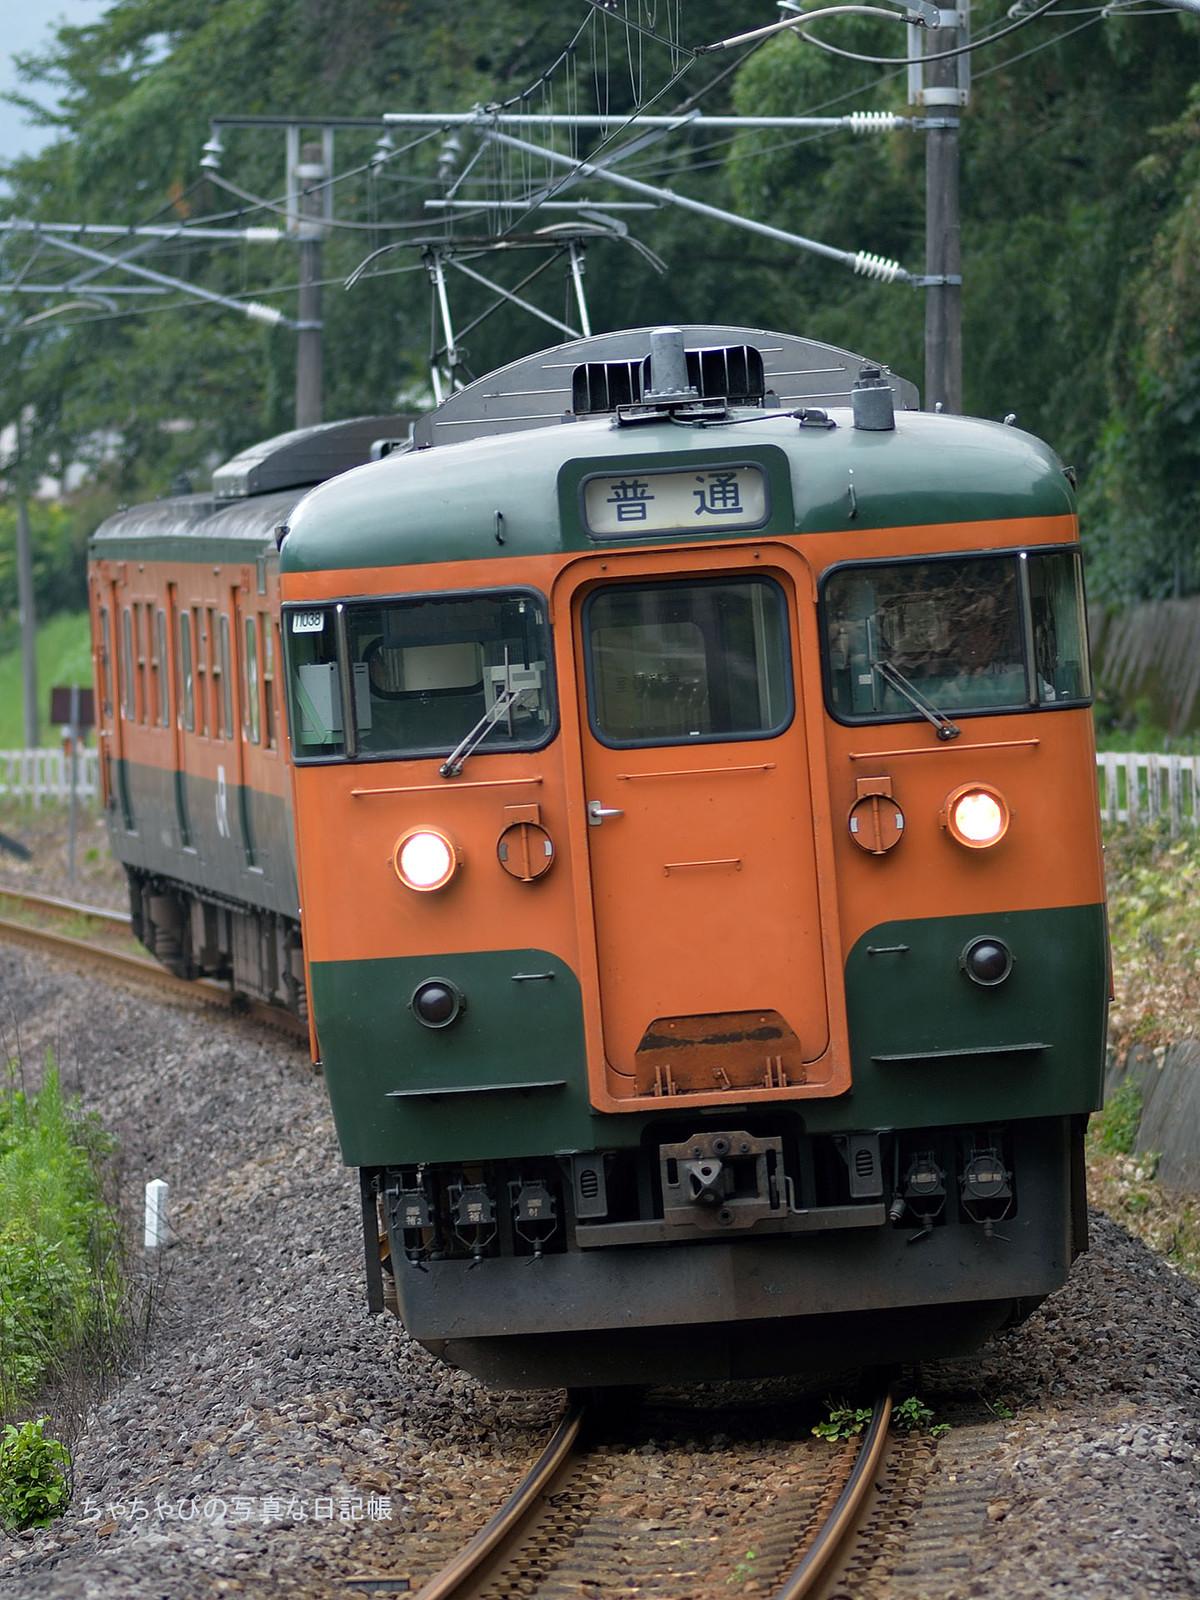 JR東日本 信越本線 西松井田駅~横川駅 115系1000番台 -T1038編成-